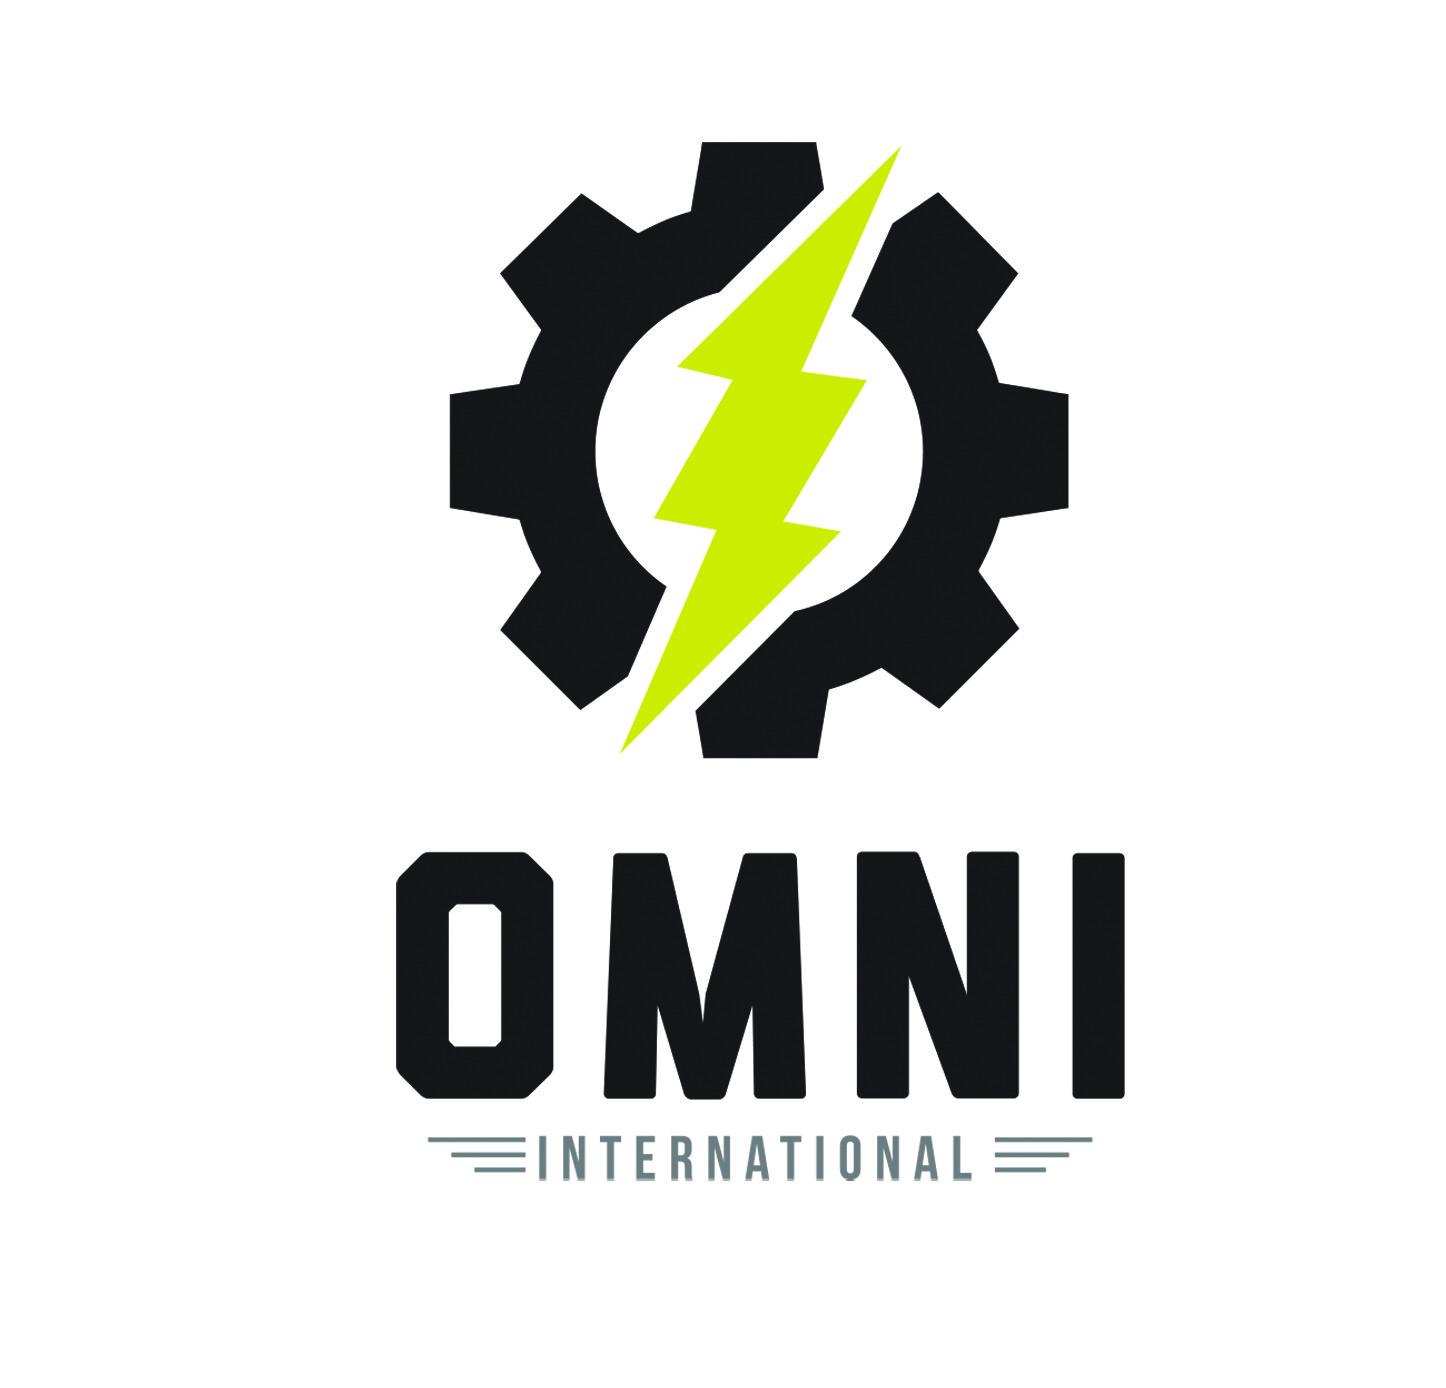 medium resolution of omni international electrical engineering logo